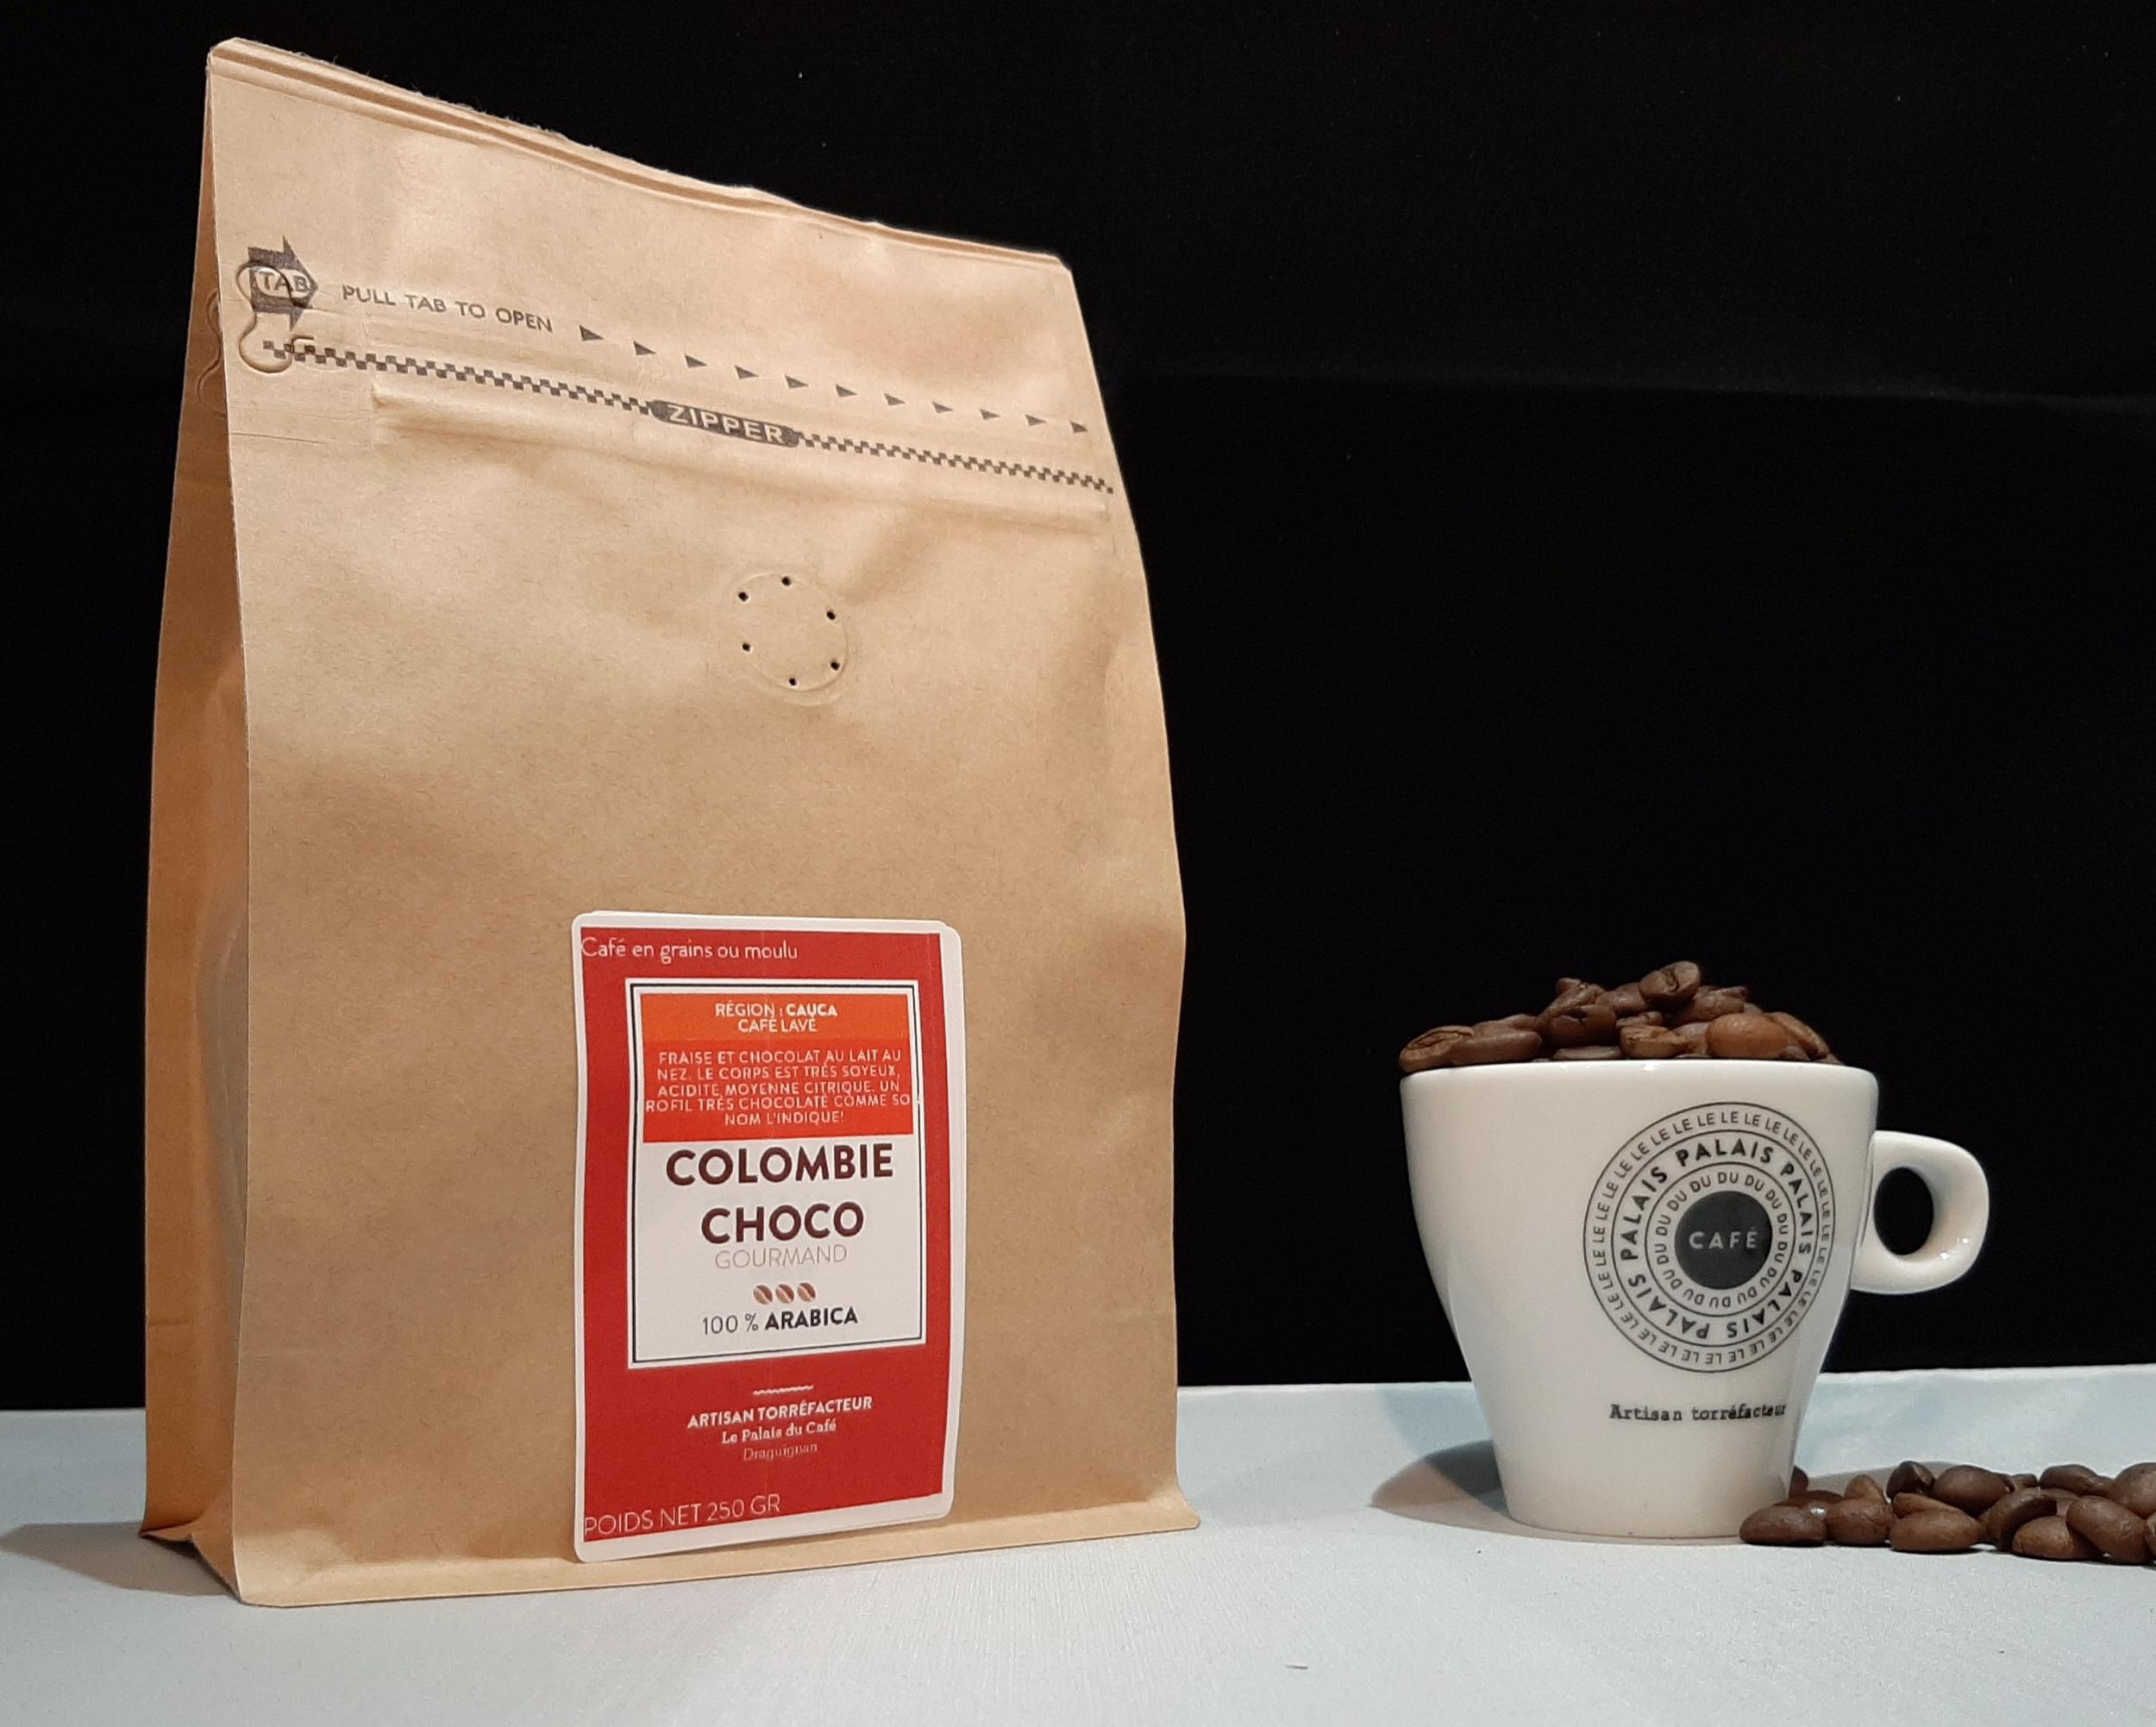 Colombie Choco 100 % Arabica - Gourmand